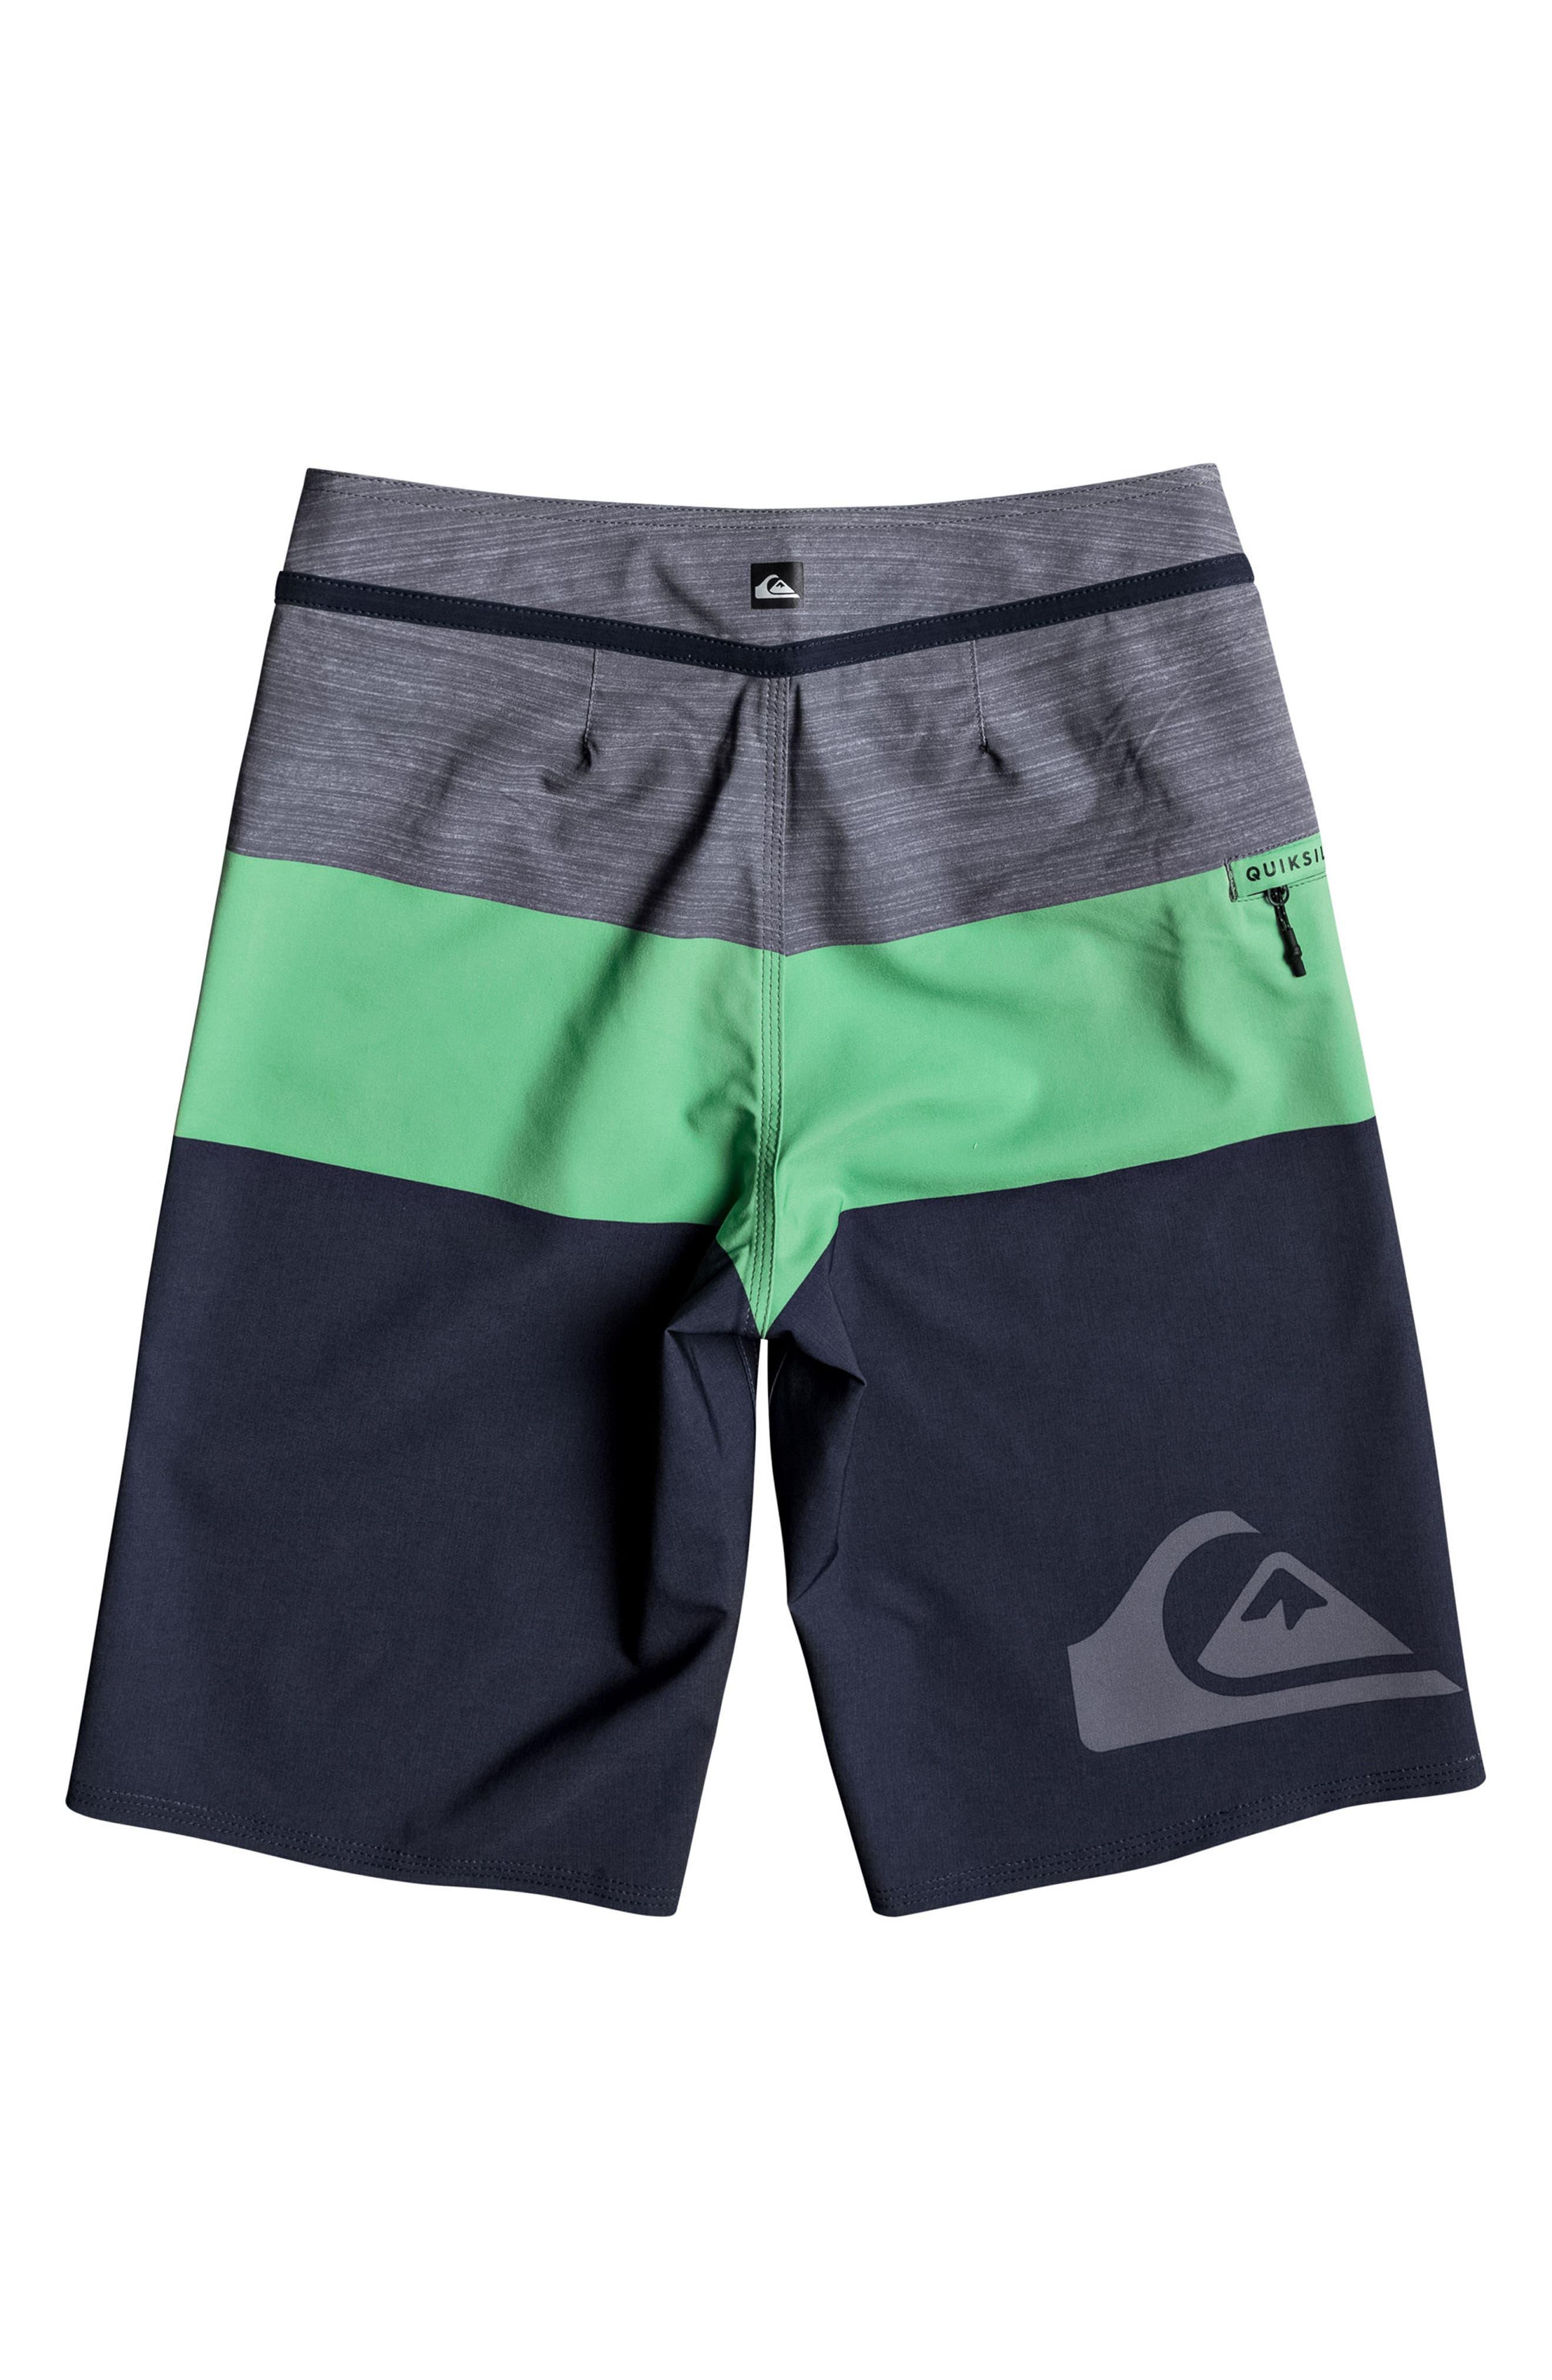 Everyday Blocked Vee Board Shorts,                             Alternate thumbnail 2, color,                             328